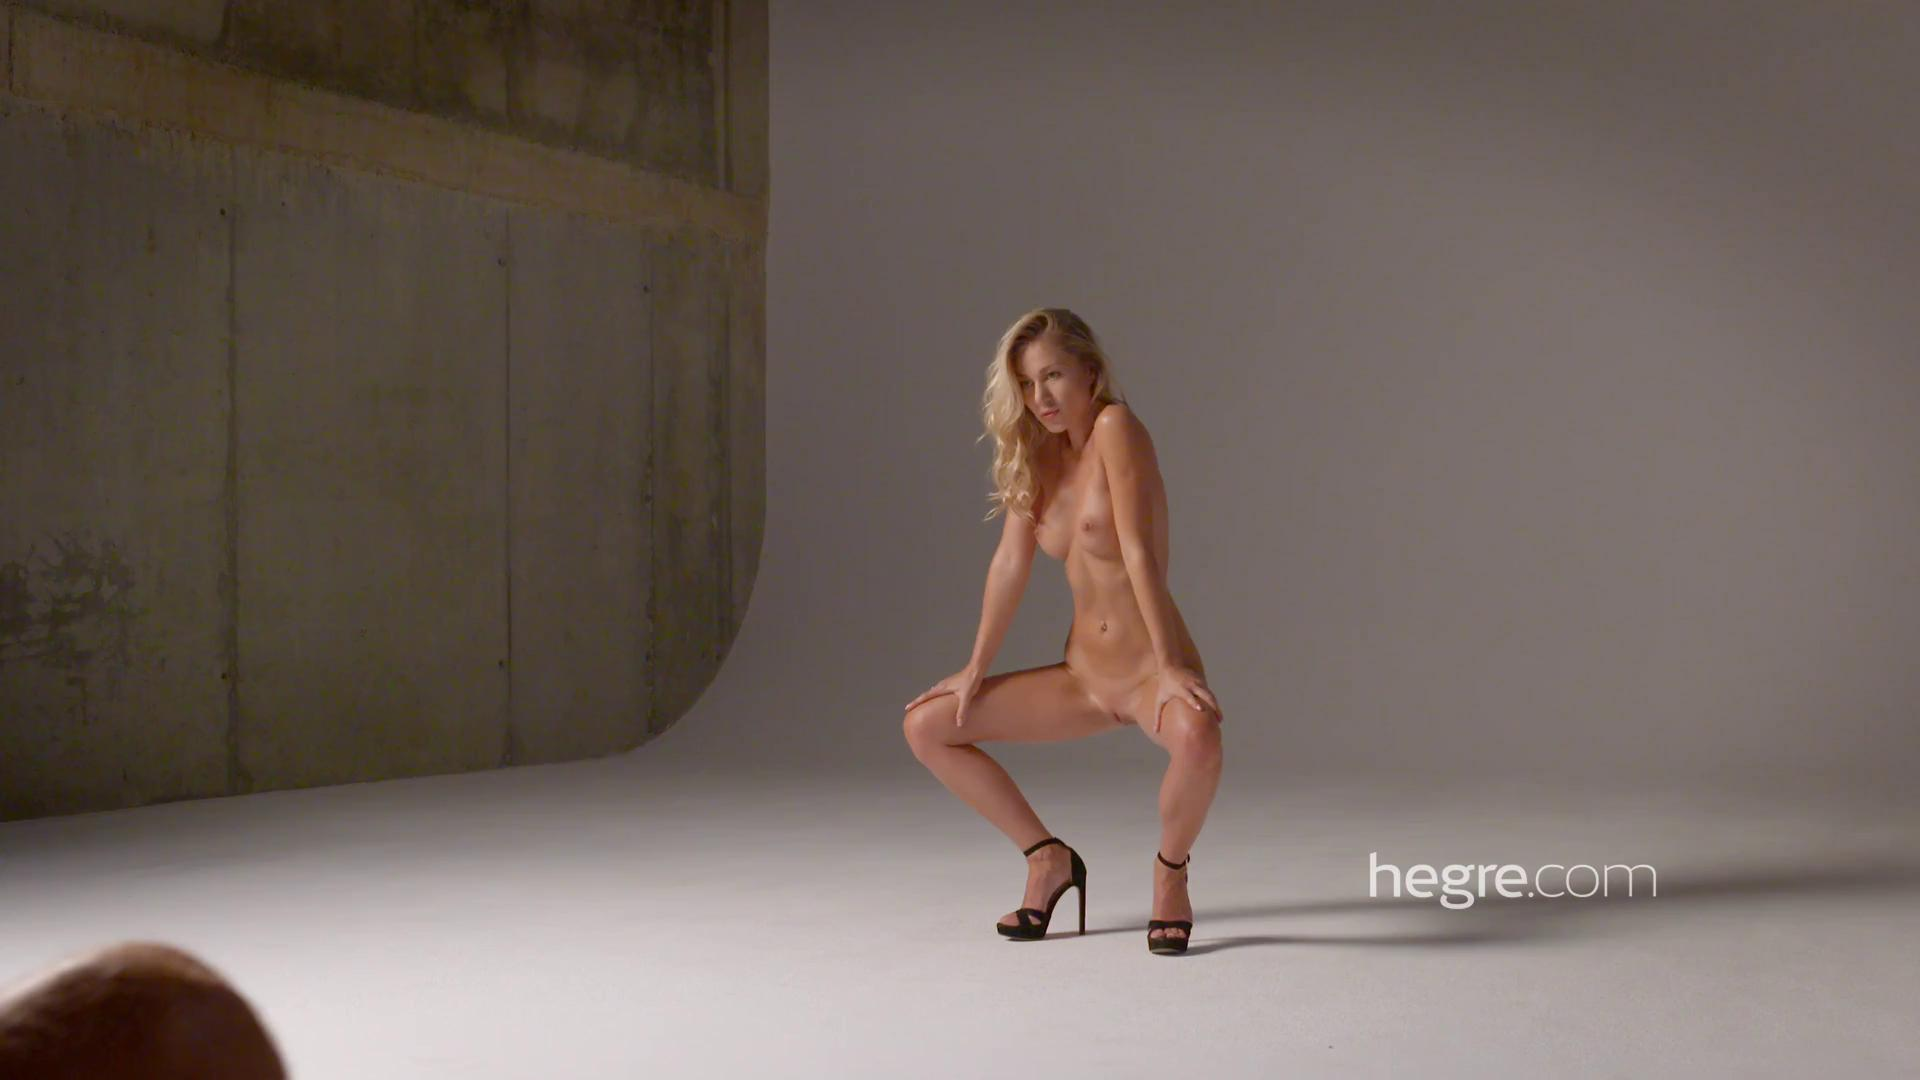 Hegre – Darina L Nude Photo Session